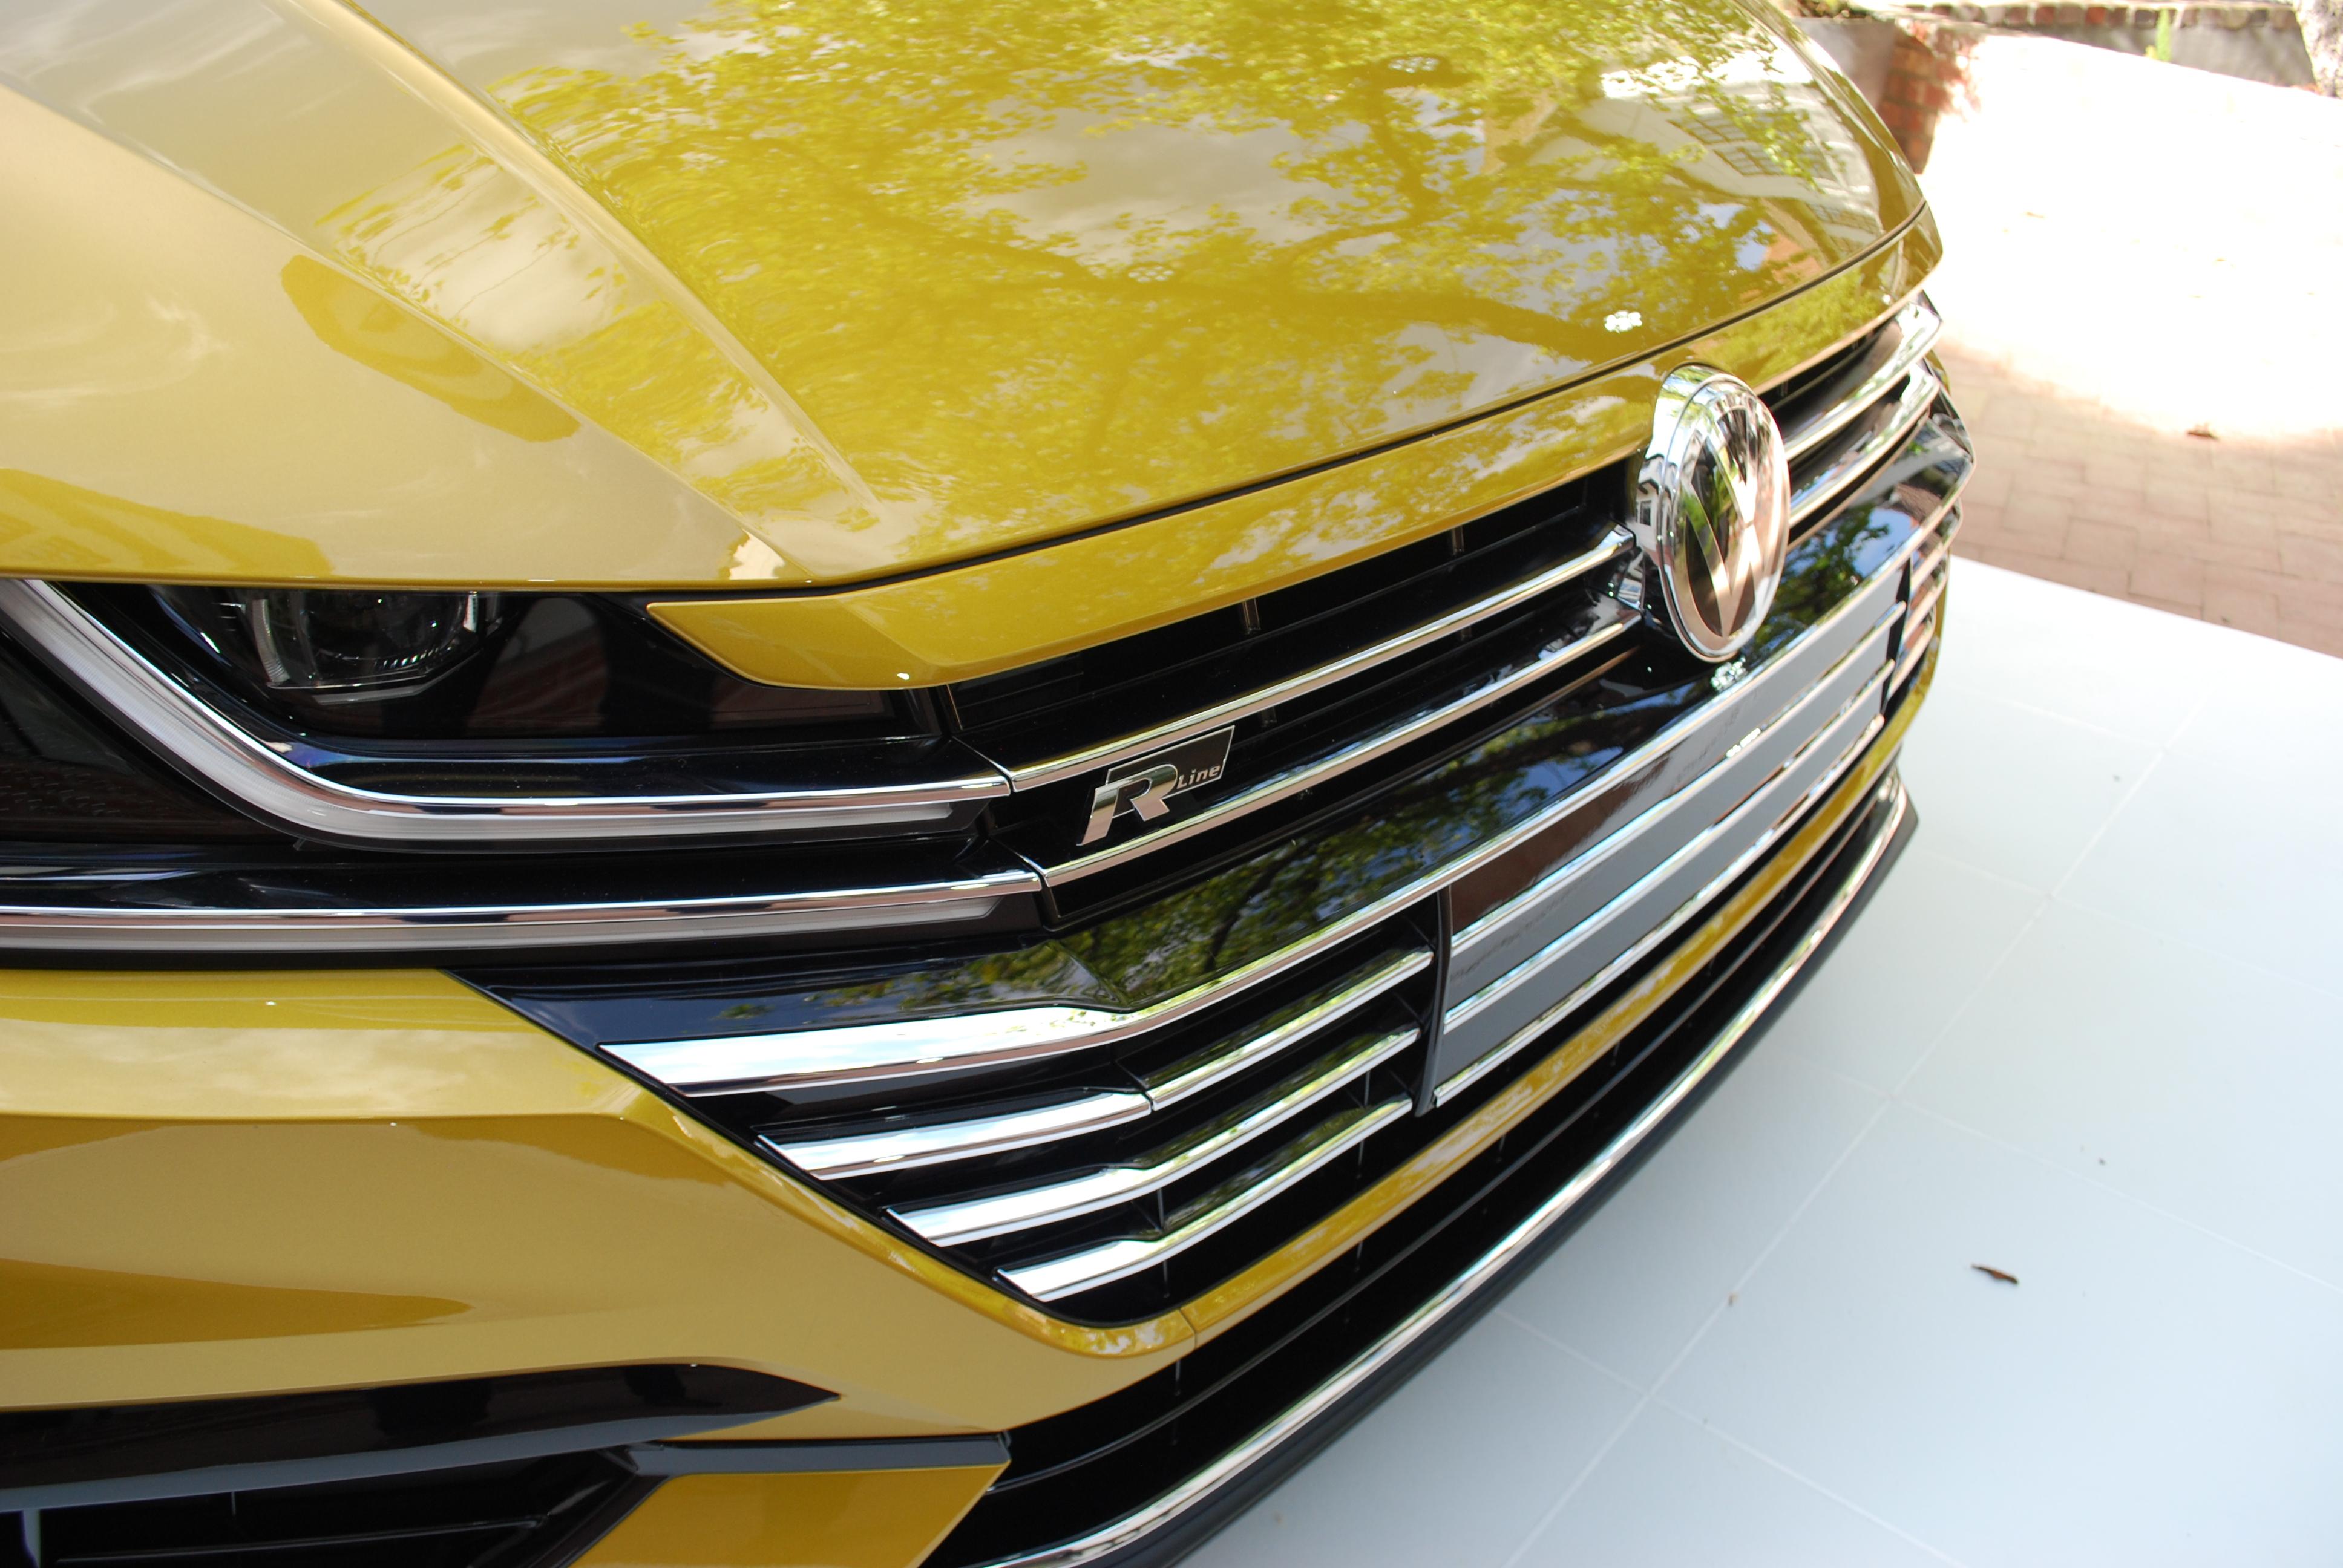 Audi red white blue photo shot maddox kay keyes audi 294 110x60 photo